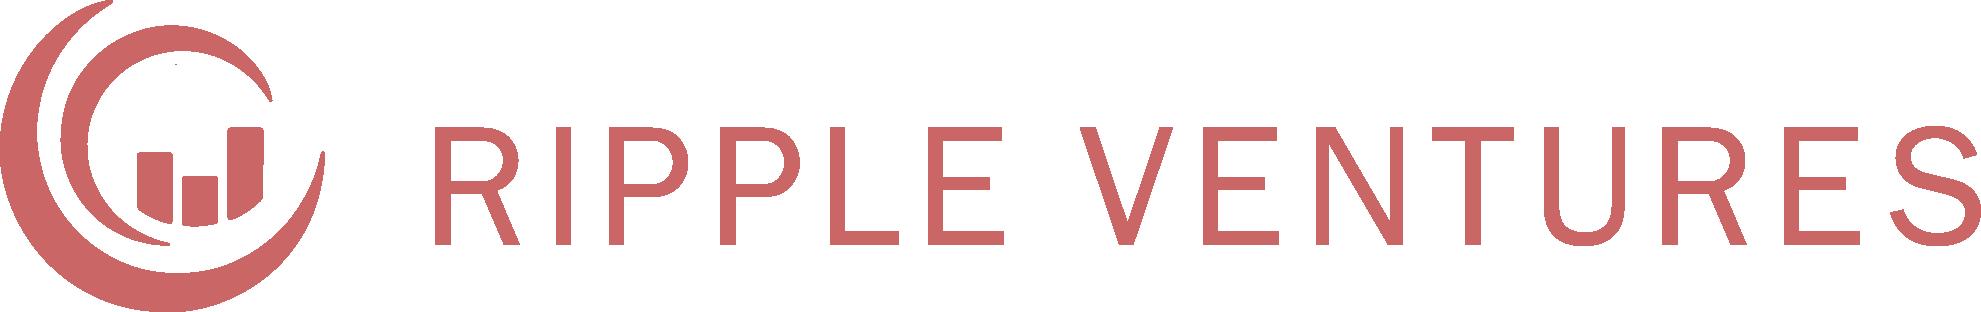 Ripple Ventures_Logo FINAL (2).png